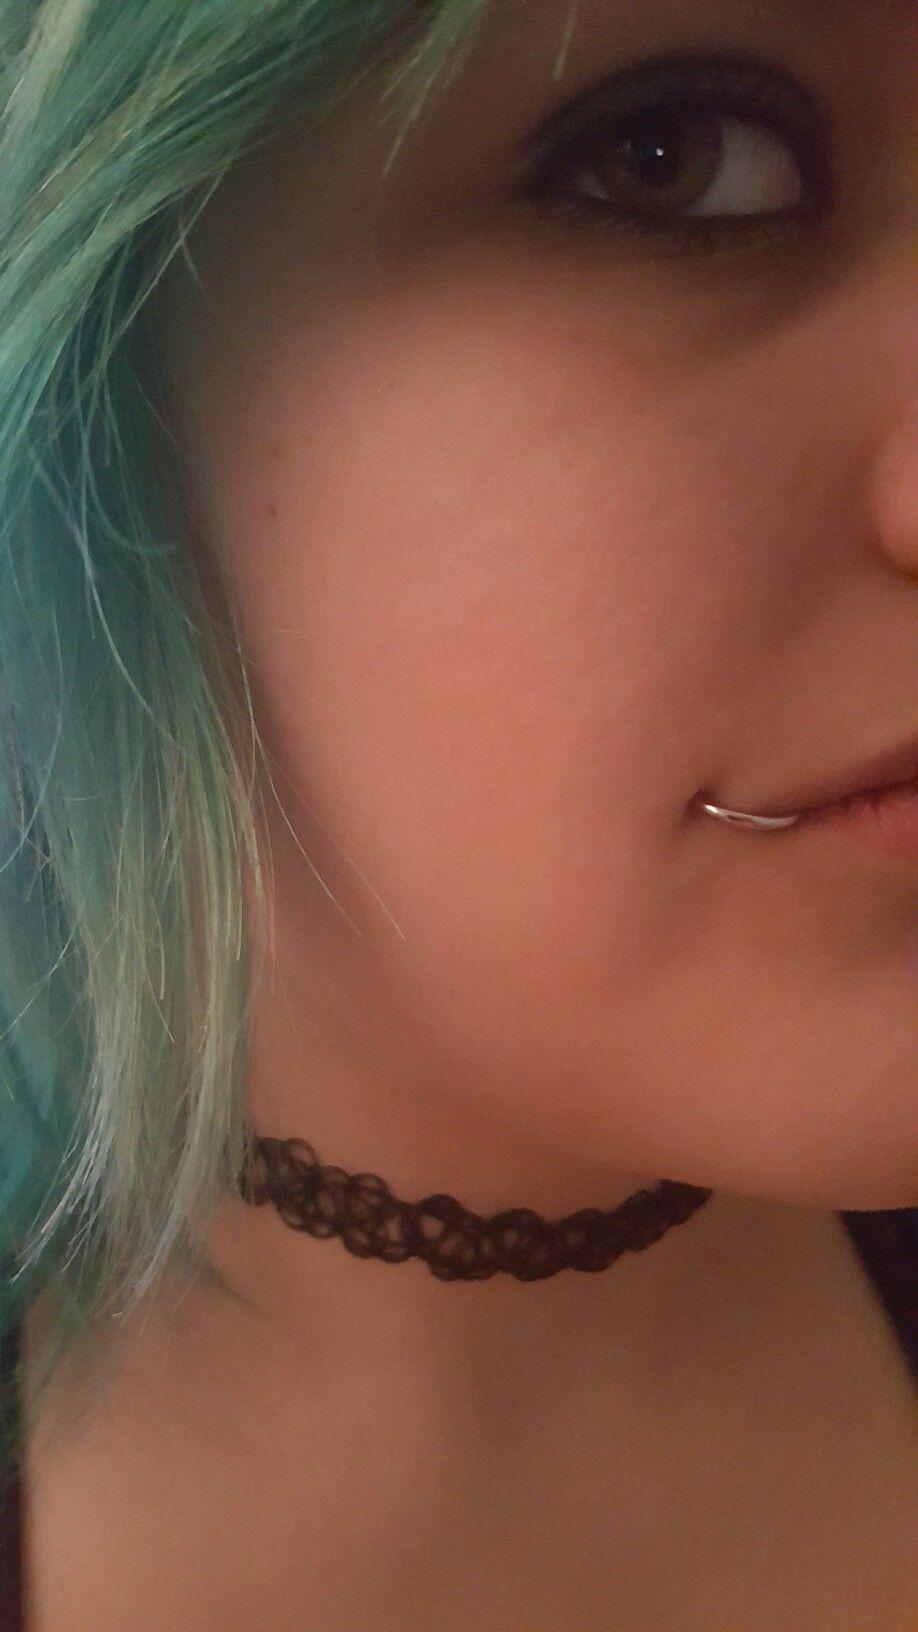 Fish Hook Lip Piercing Lip Piercing Piercings Nose Ring